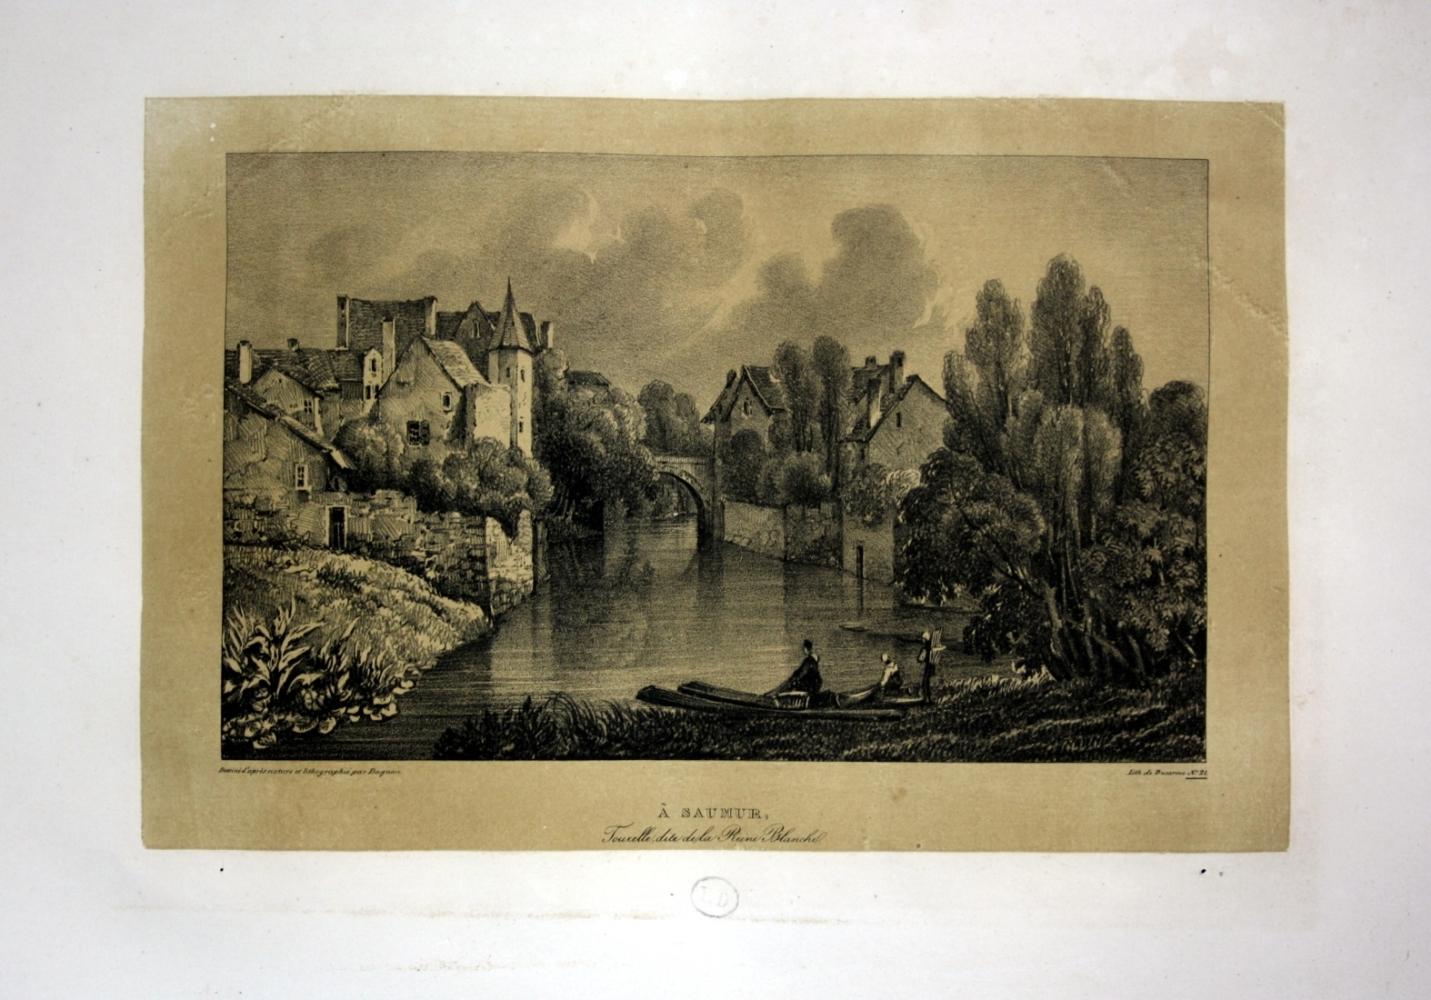 A Saumur tourelle dite de la Ruine: Dagnan, Isodore: